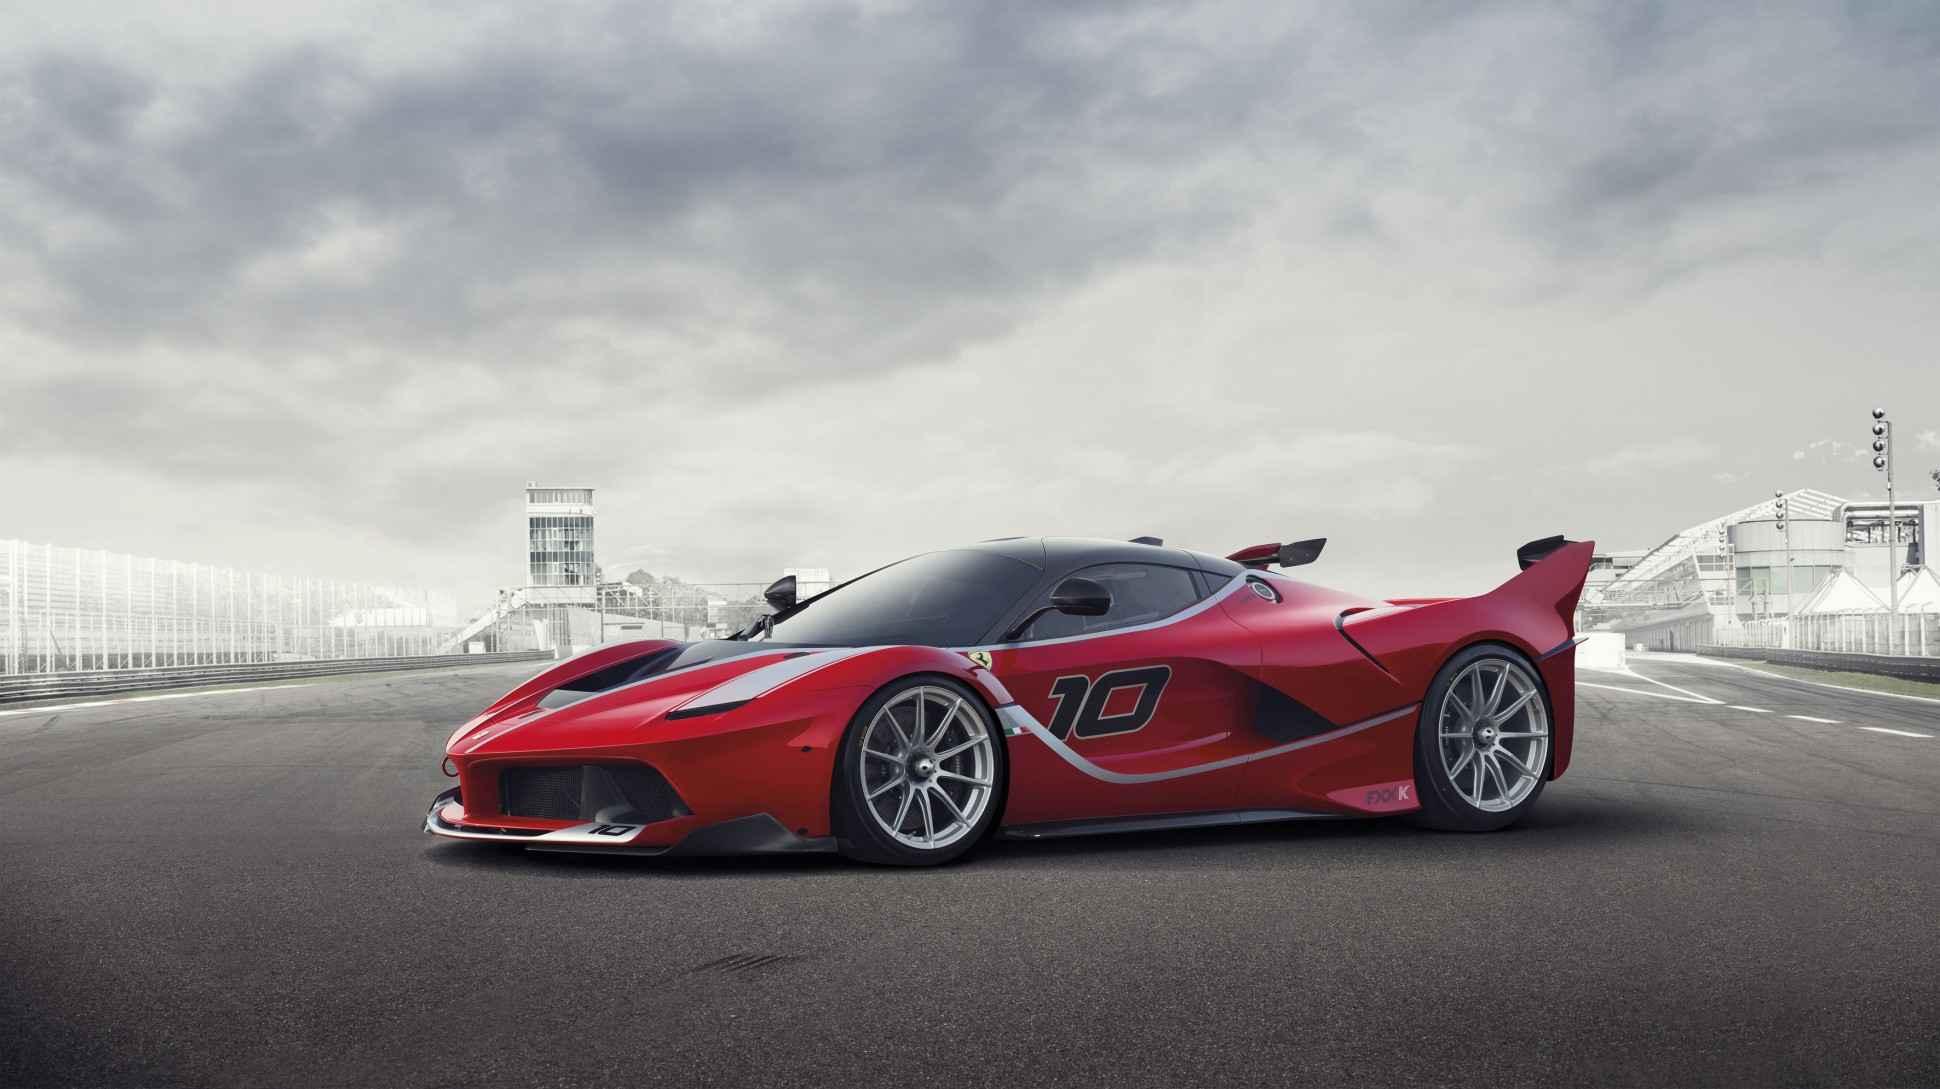 1400443_CAR-Ferrari-FXXK-1940x1089